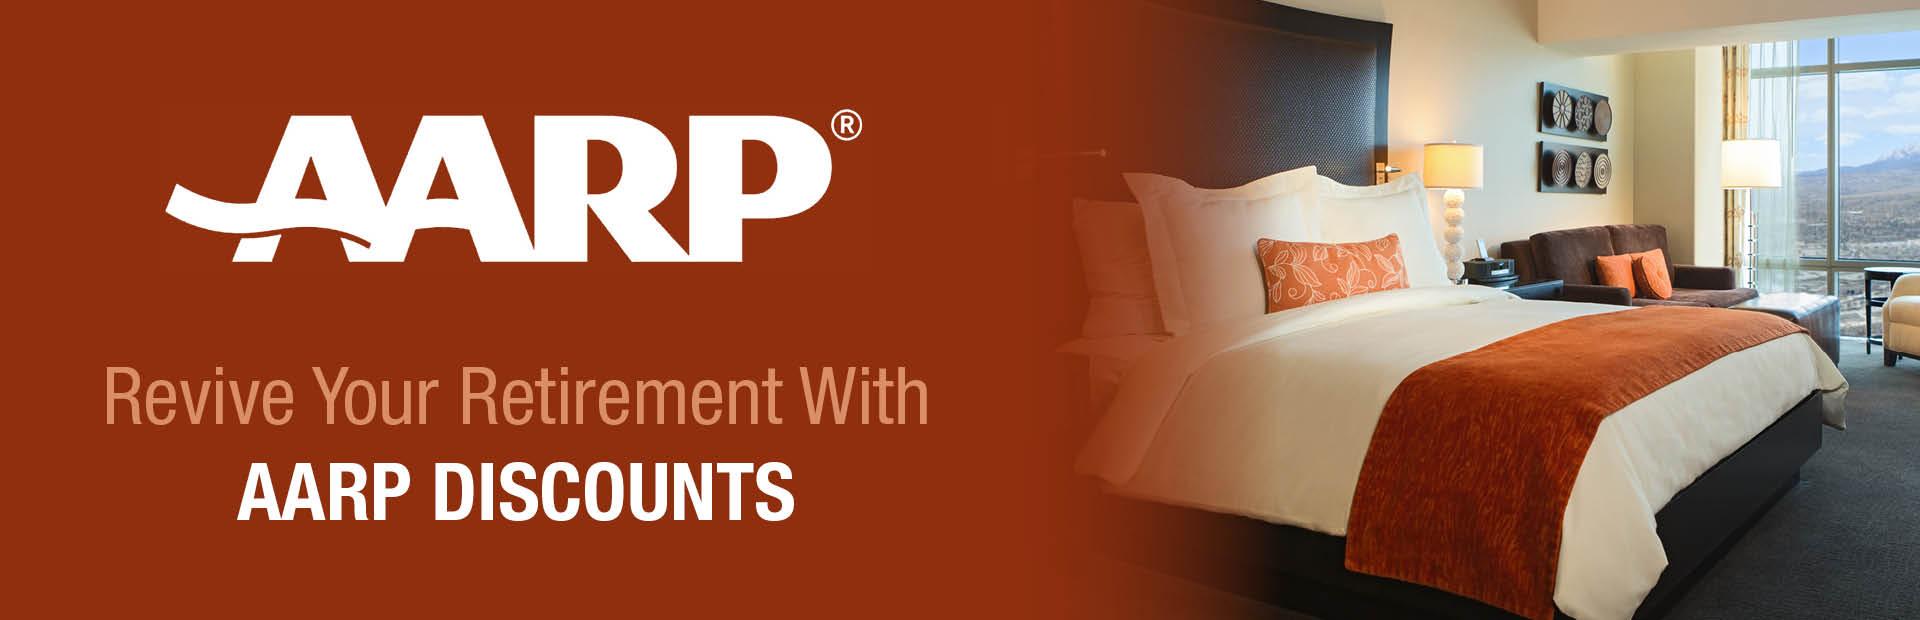 Revive your retirement with AARP Member Discounts